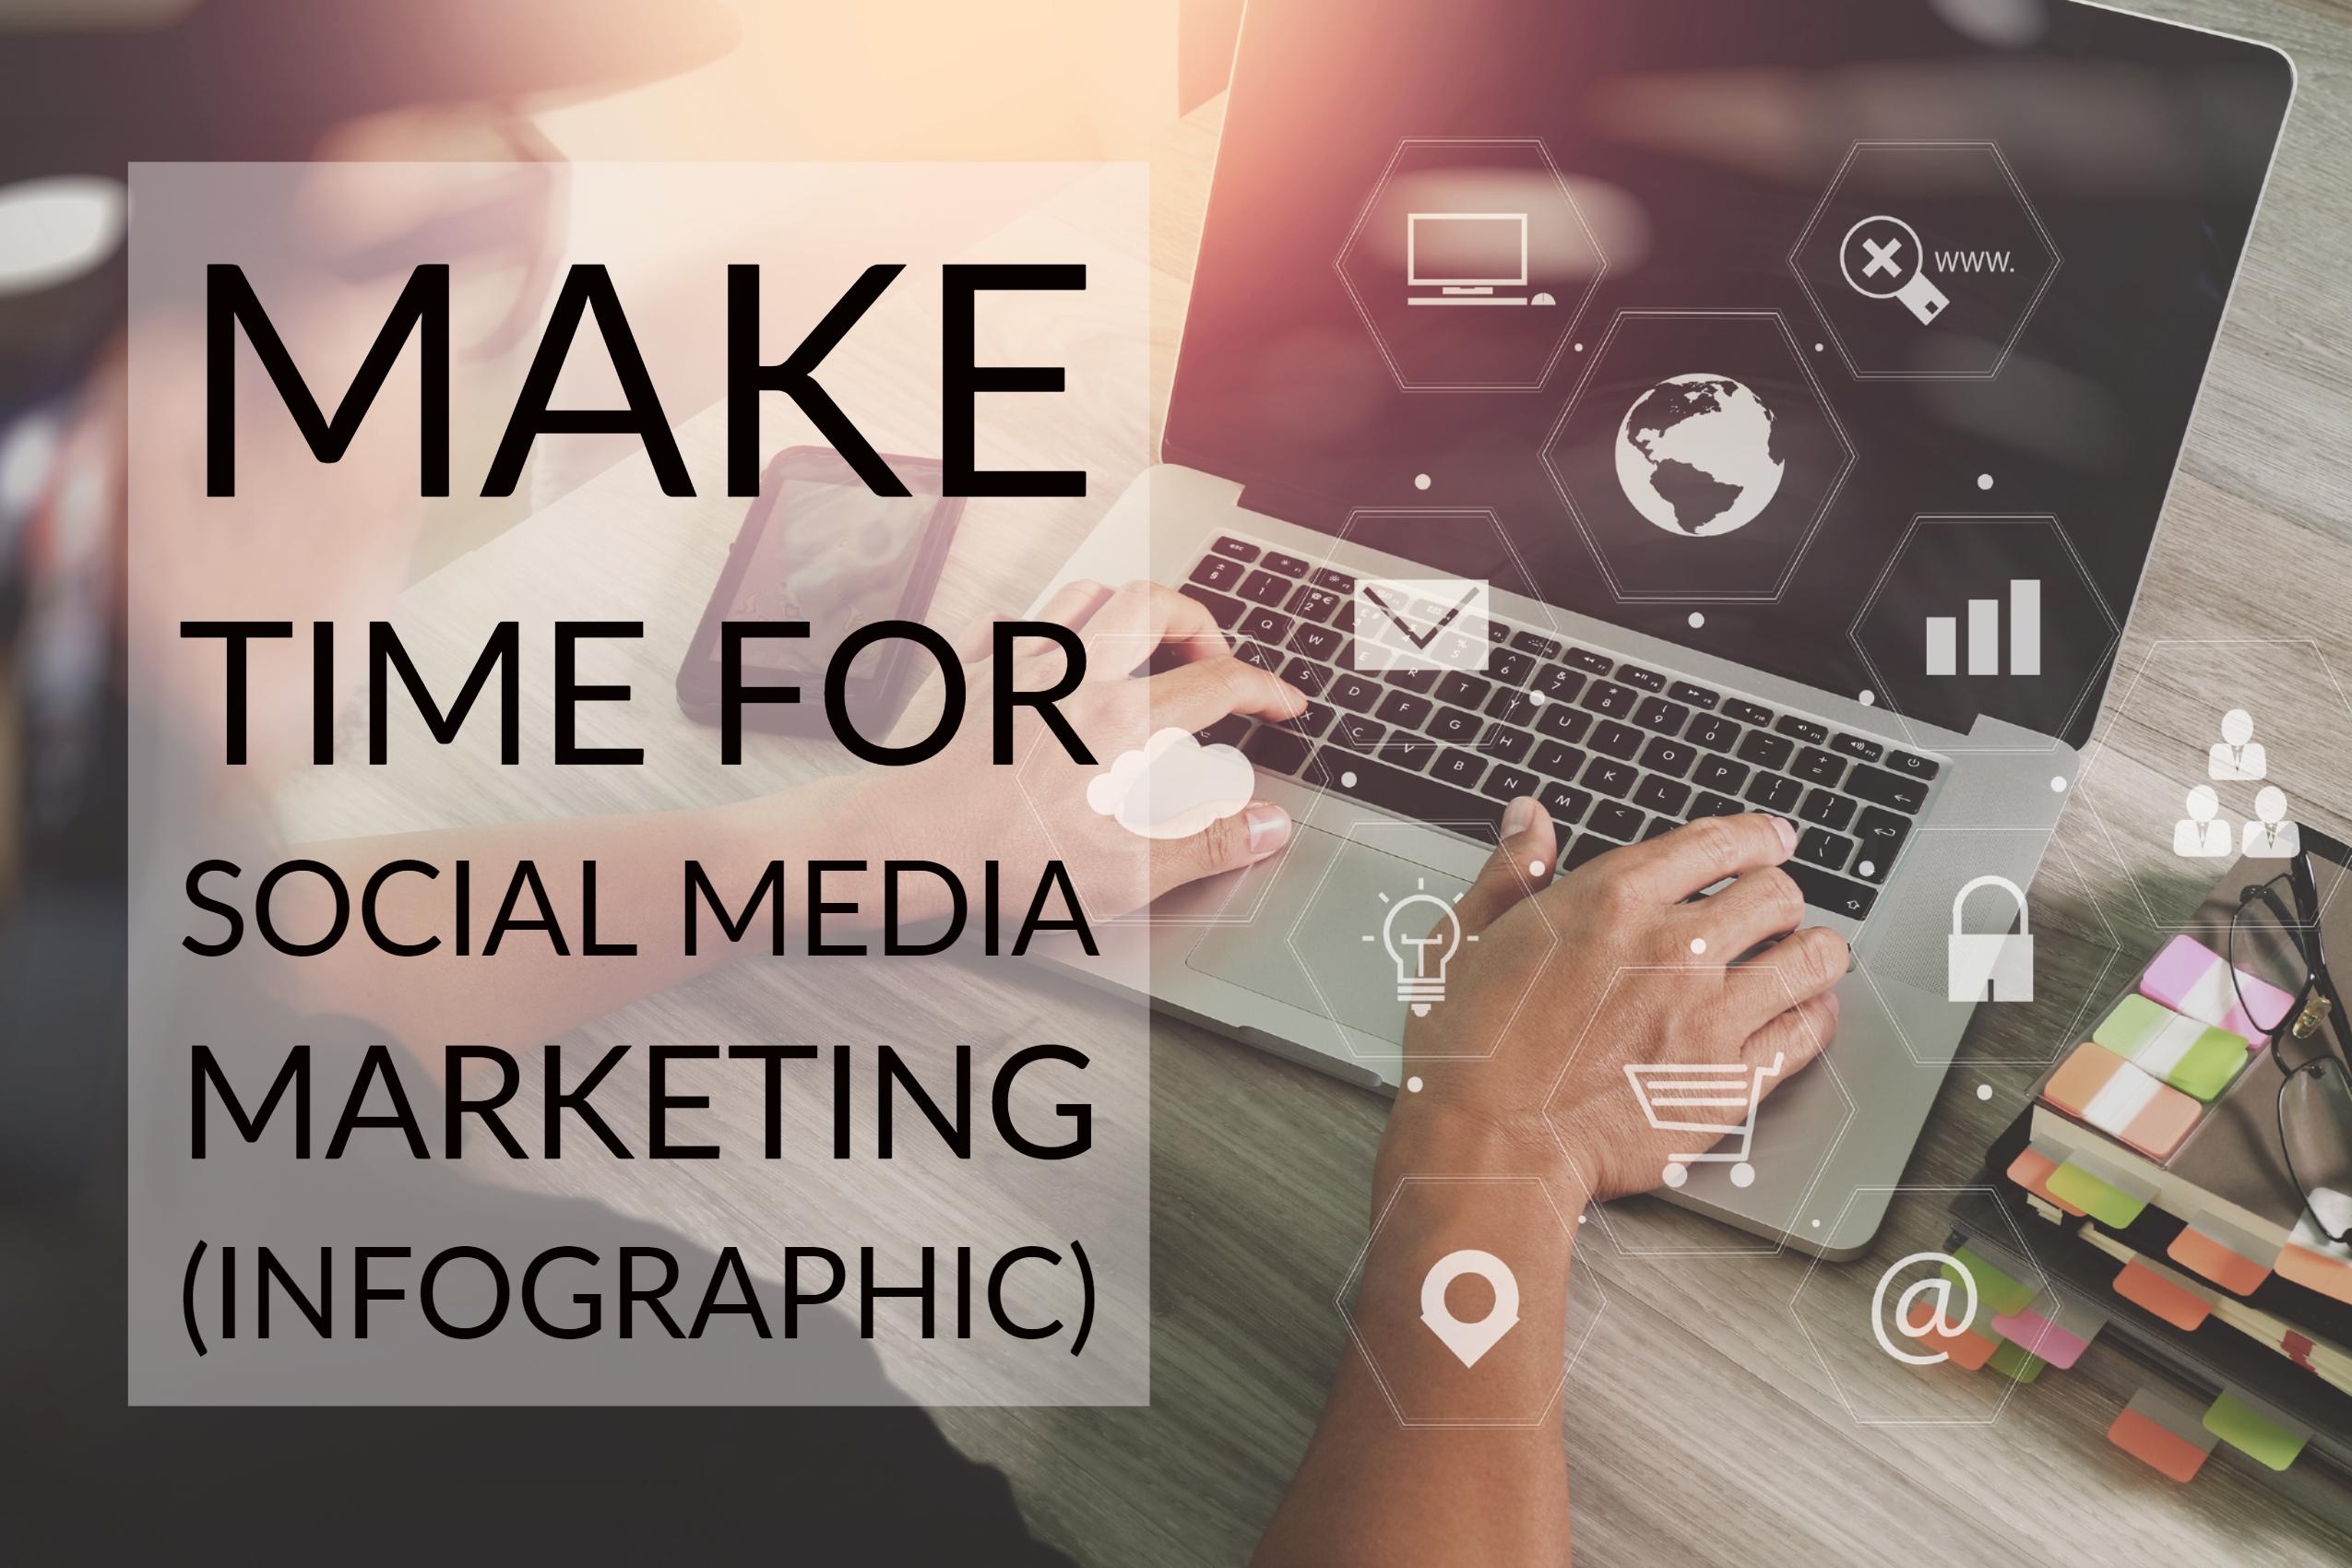 Make Time For Social Media Marketing (infographic)